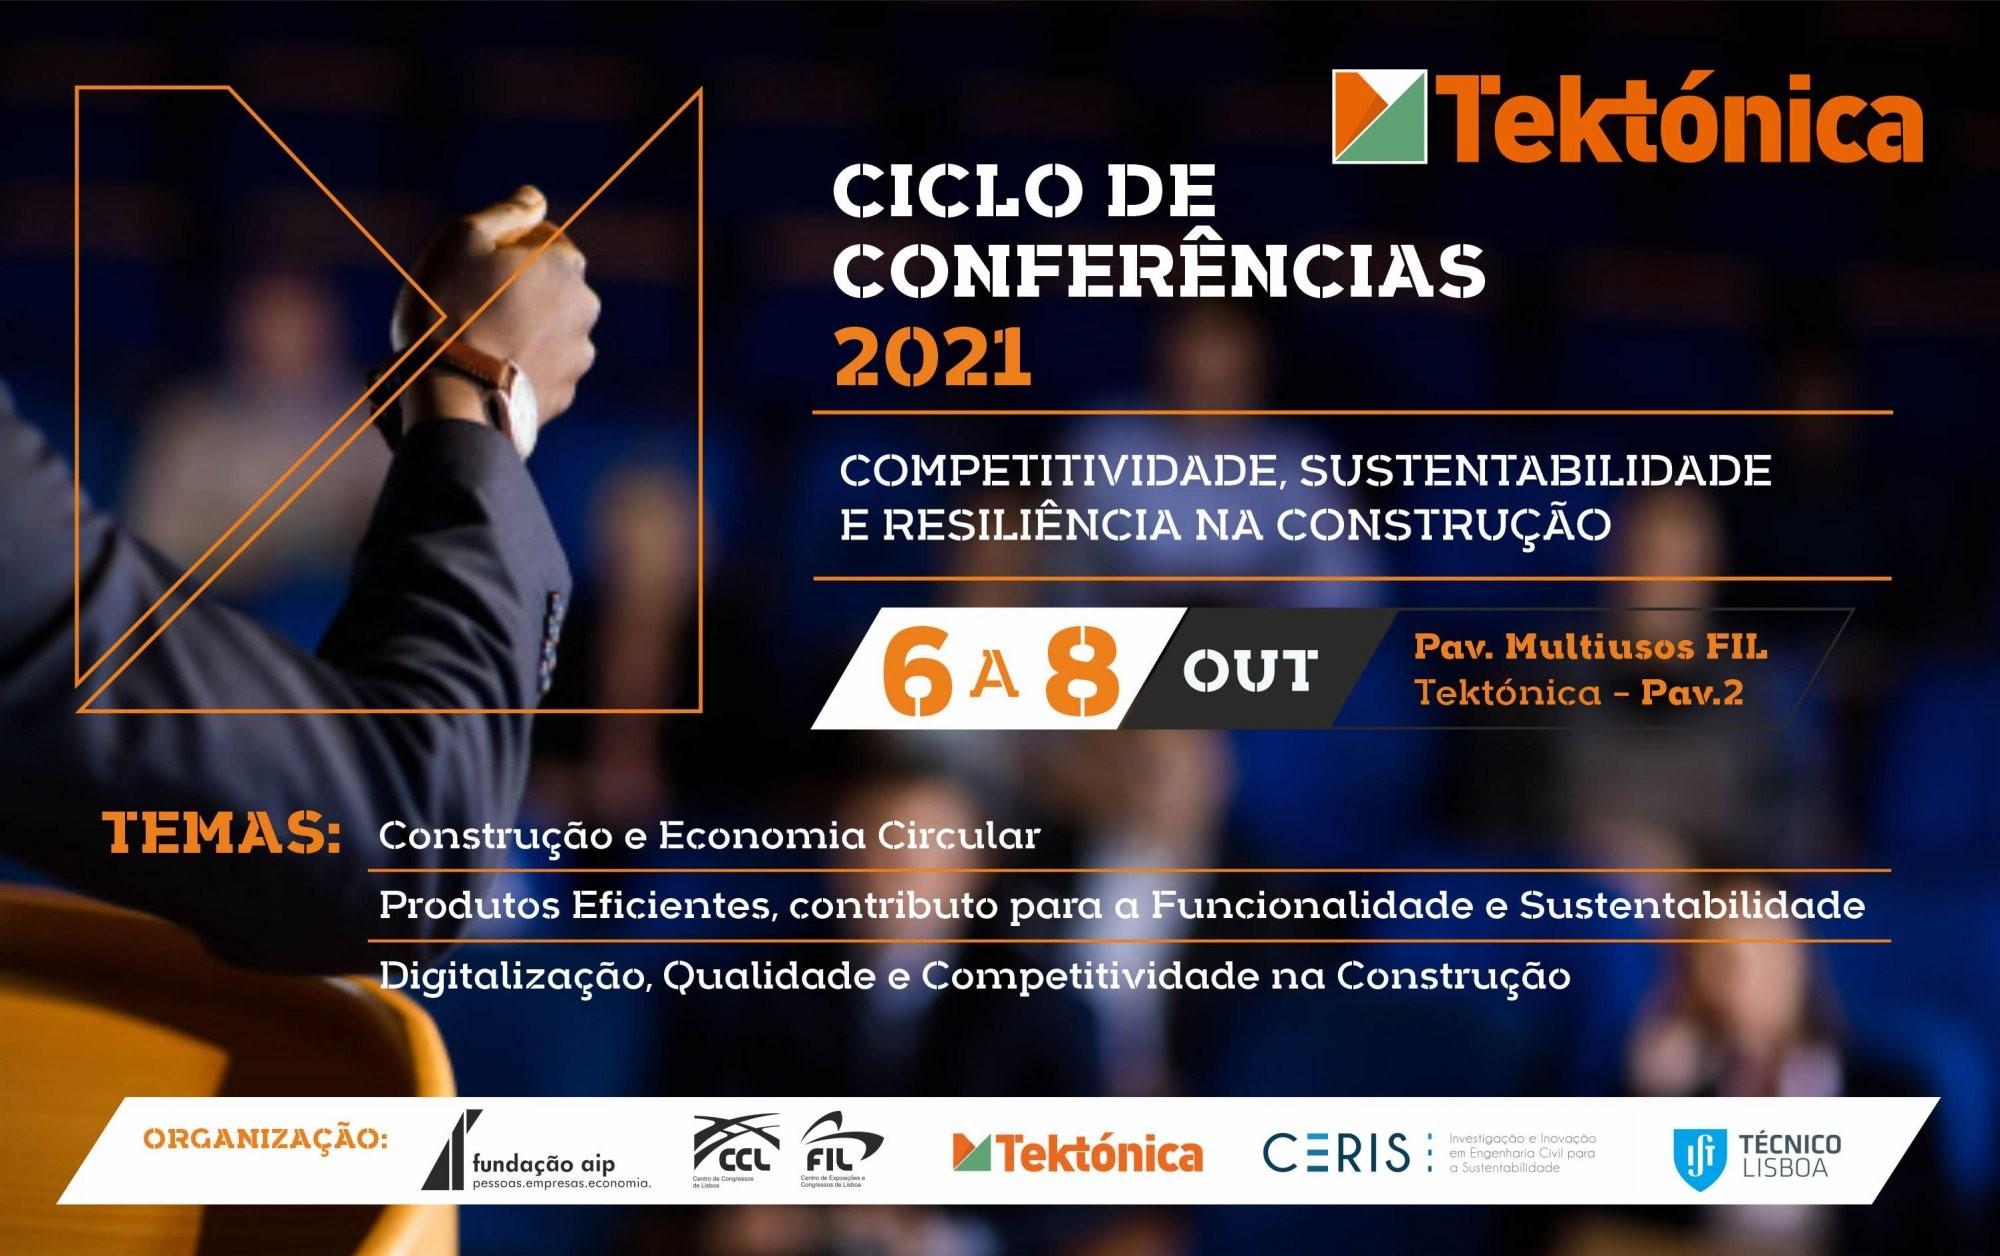 Ciclo de Conferências | Tektónica 2021